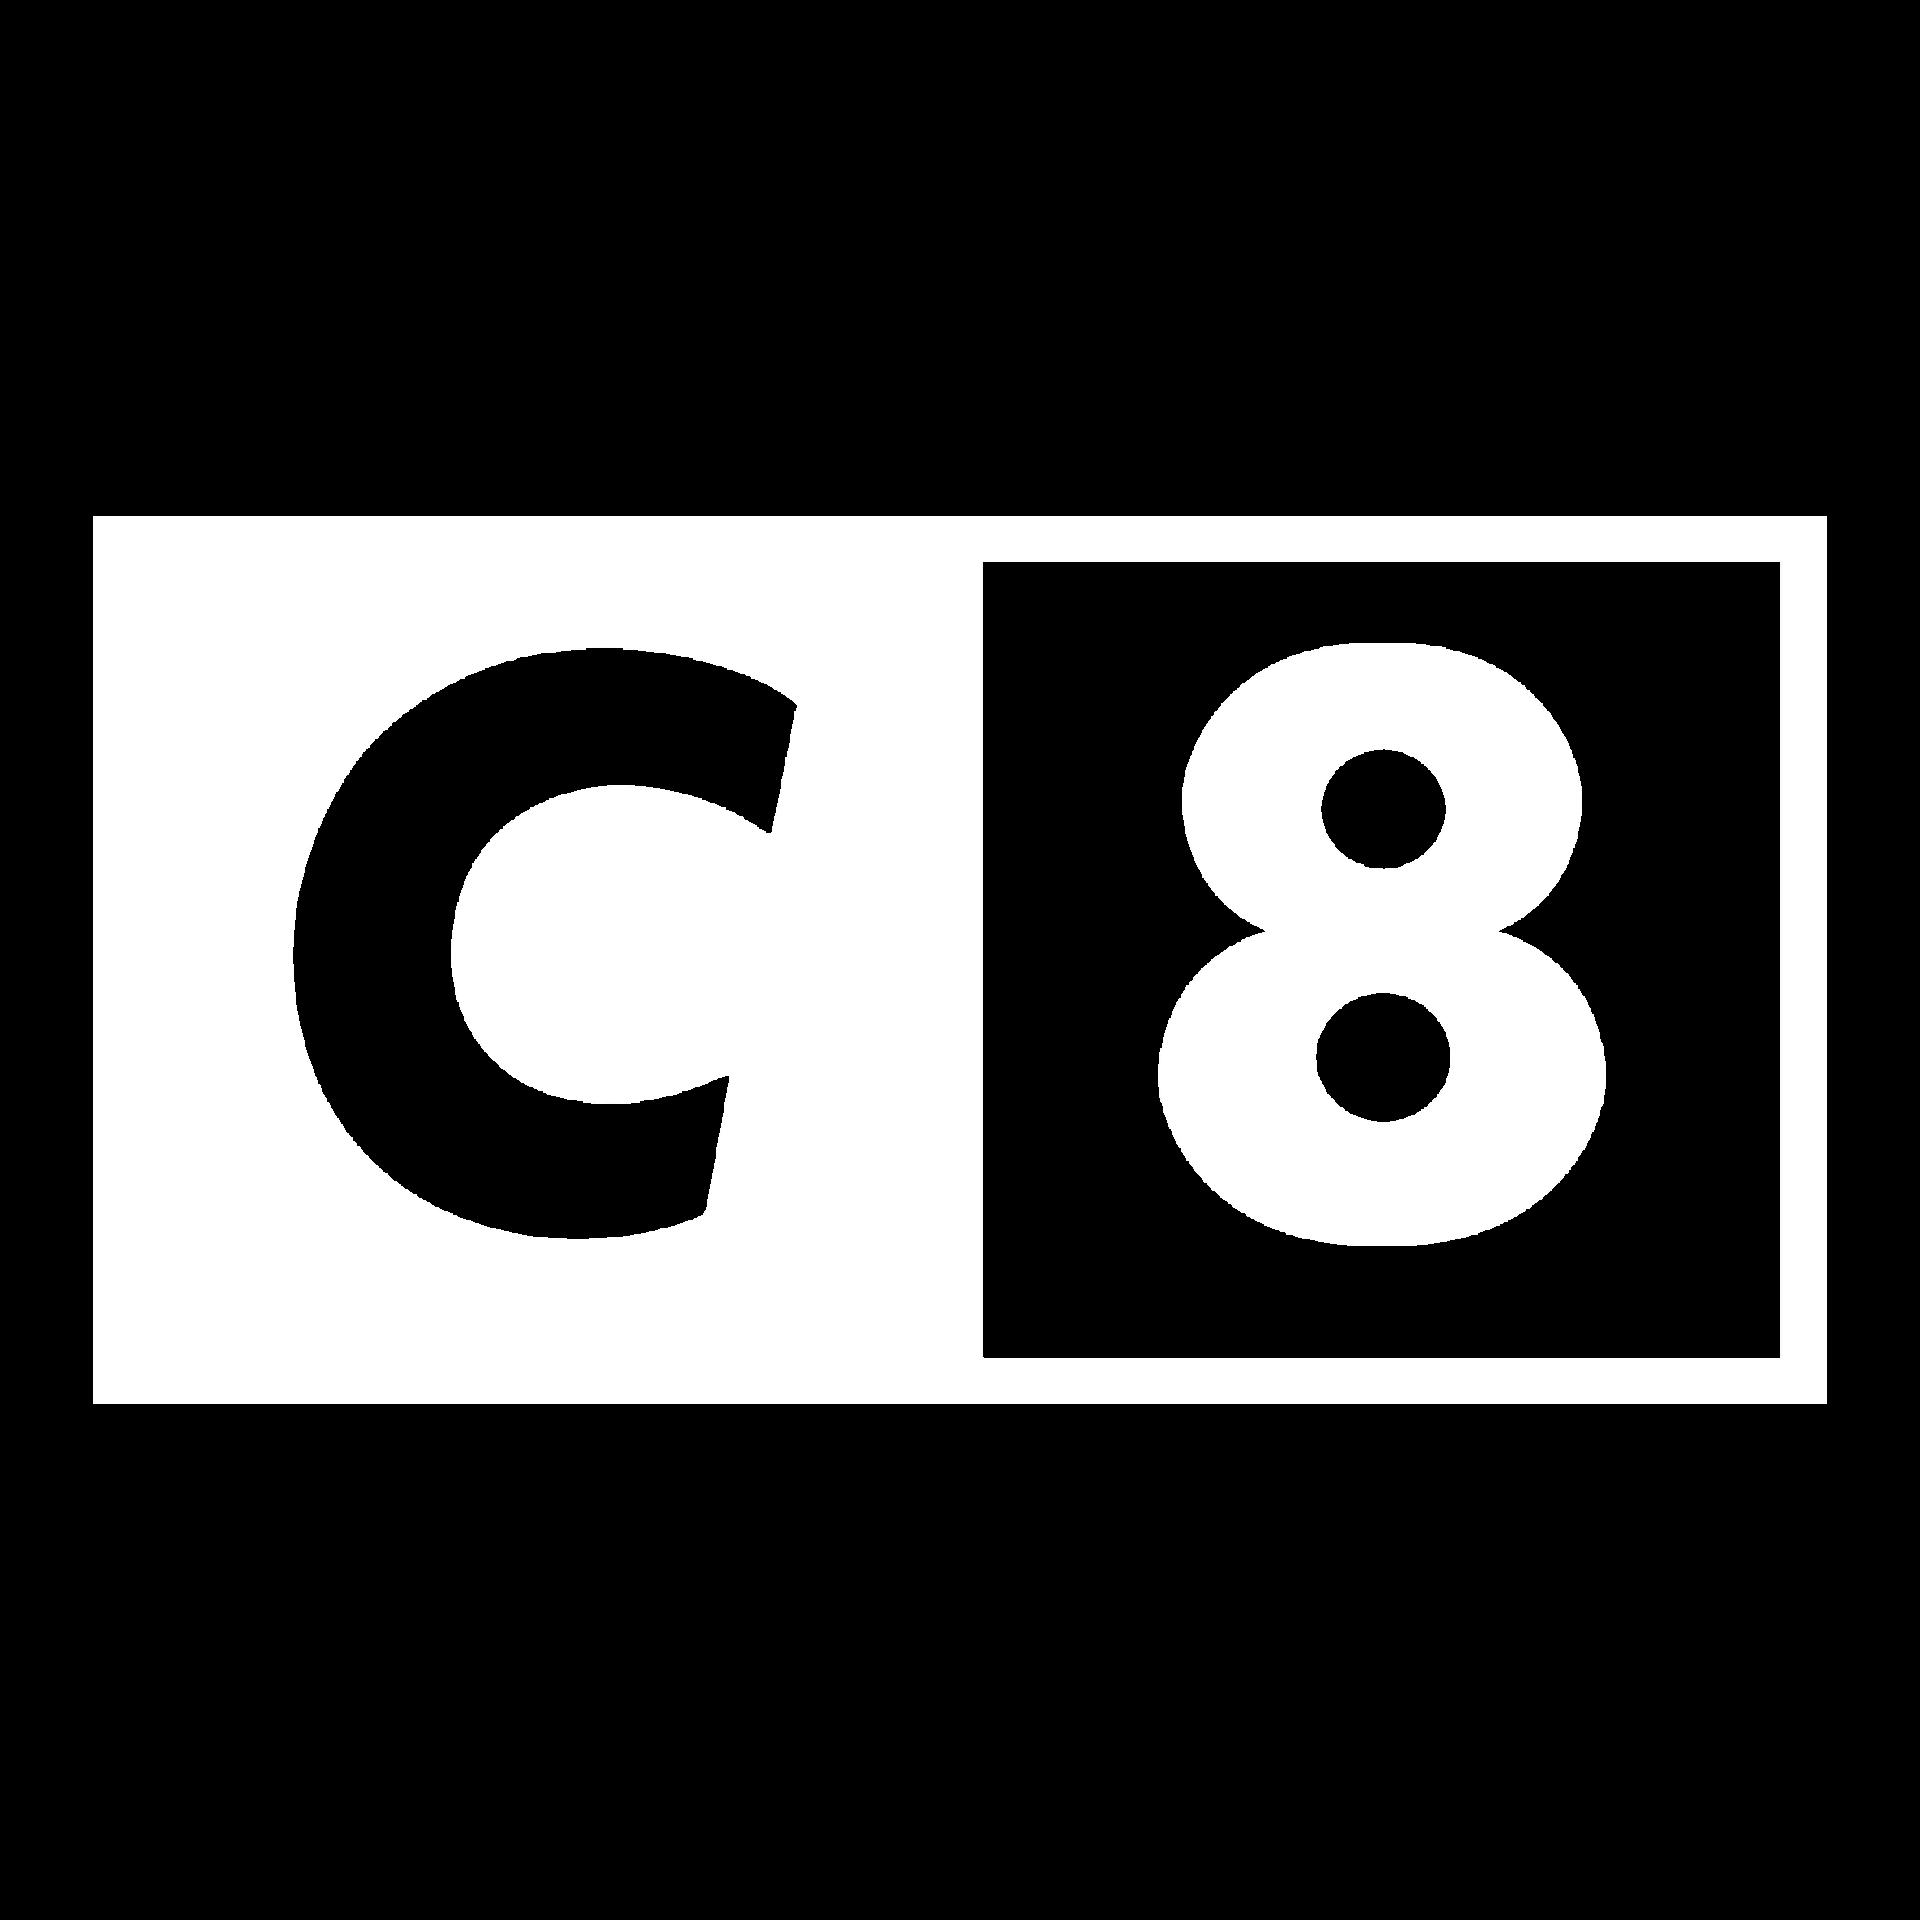 C8 - Transfer